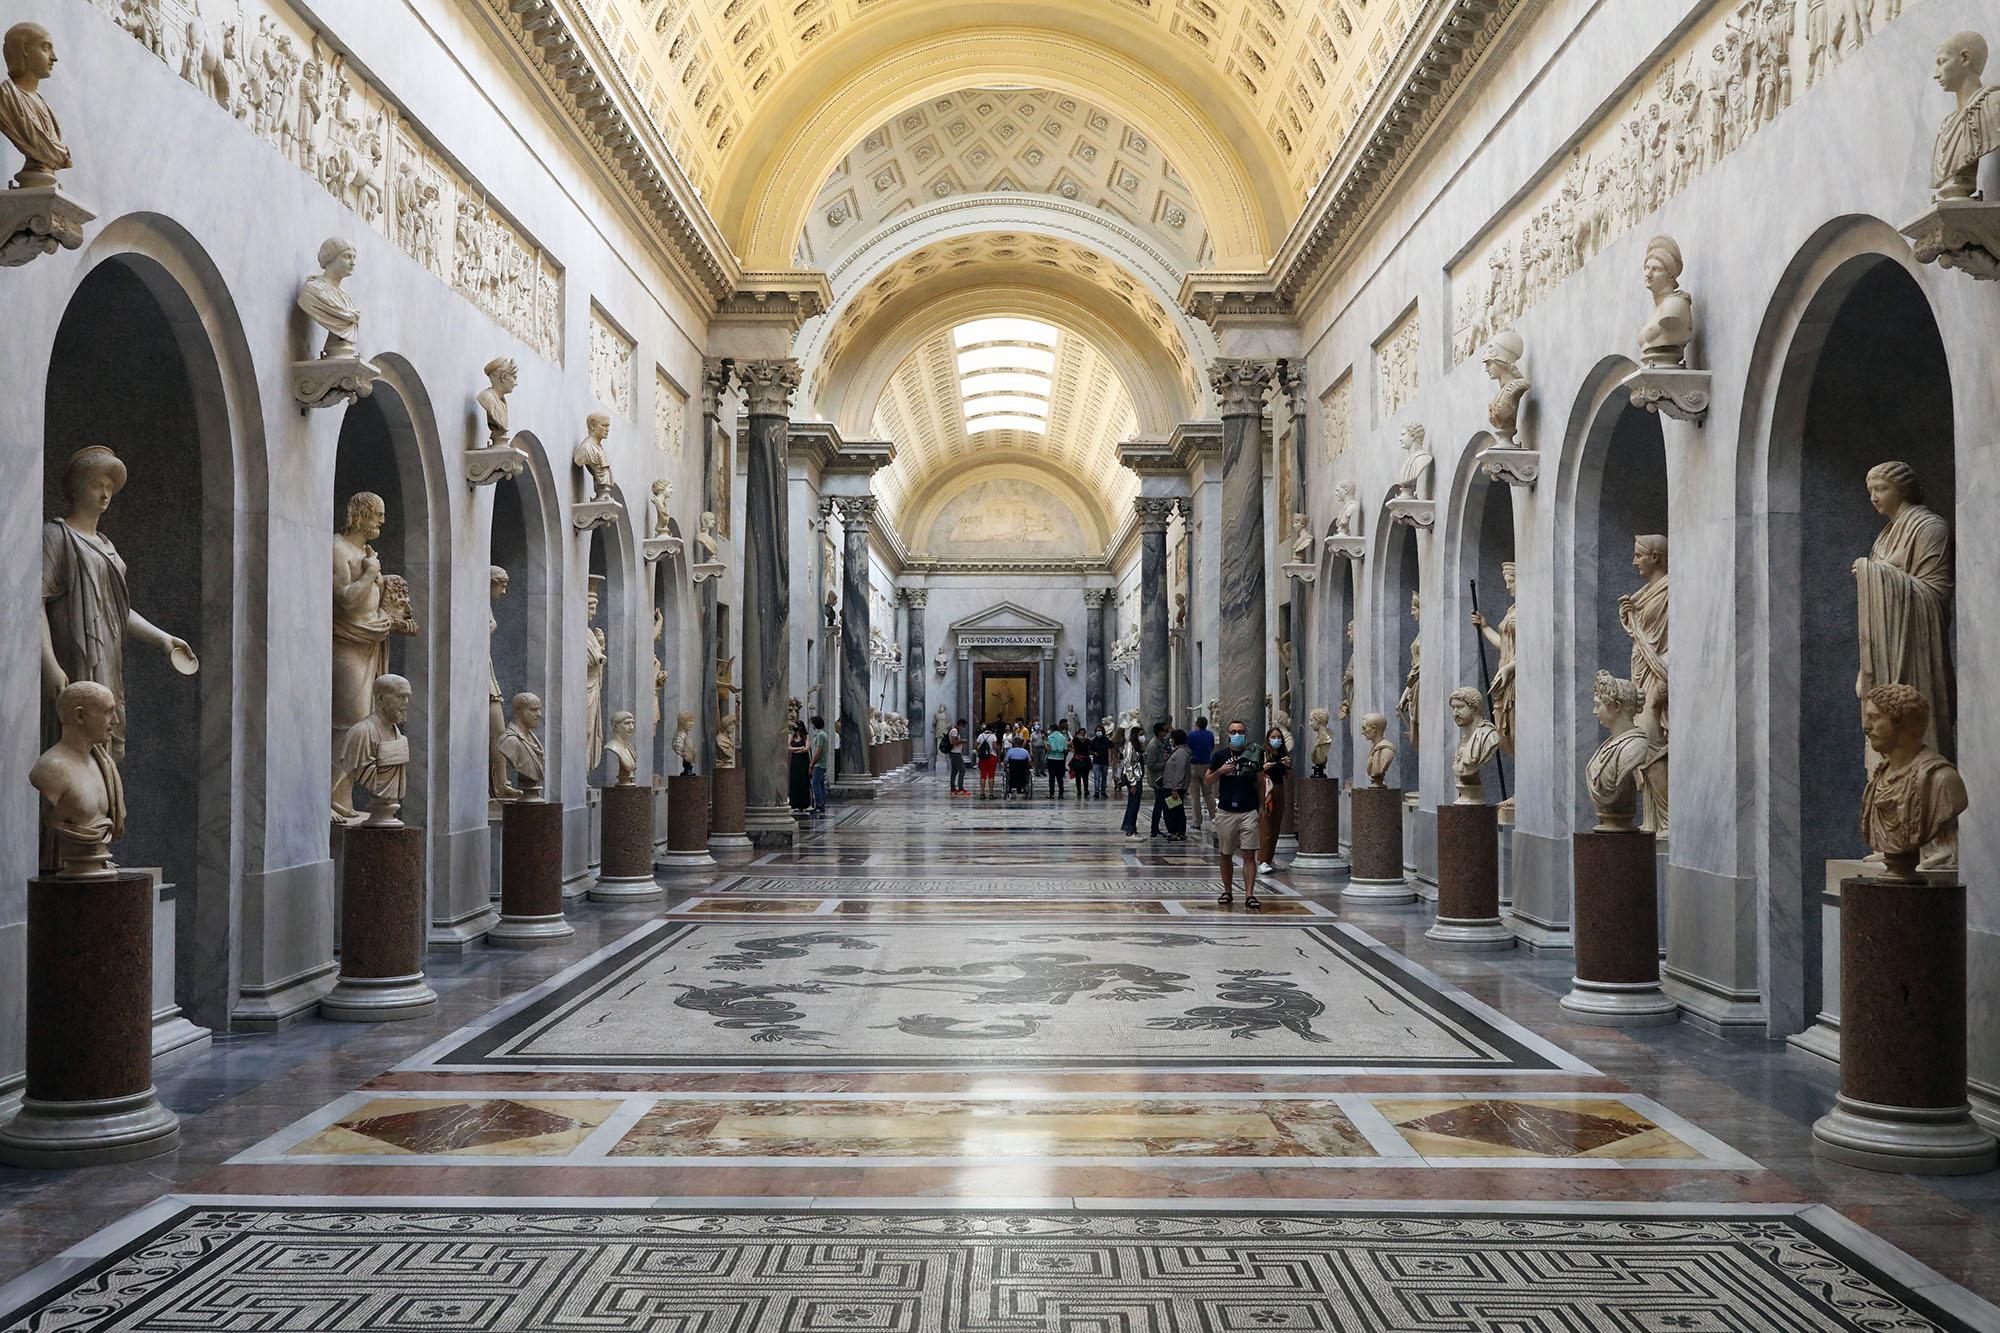 The sculptures of theBraccio Nuovoof the Vatican's Chiaramonti Gallery on June 8.